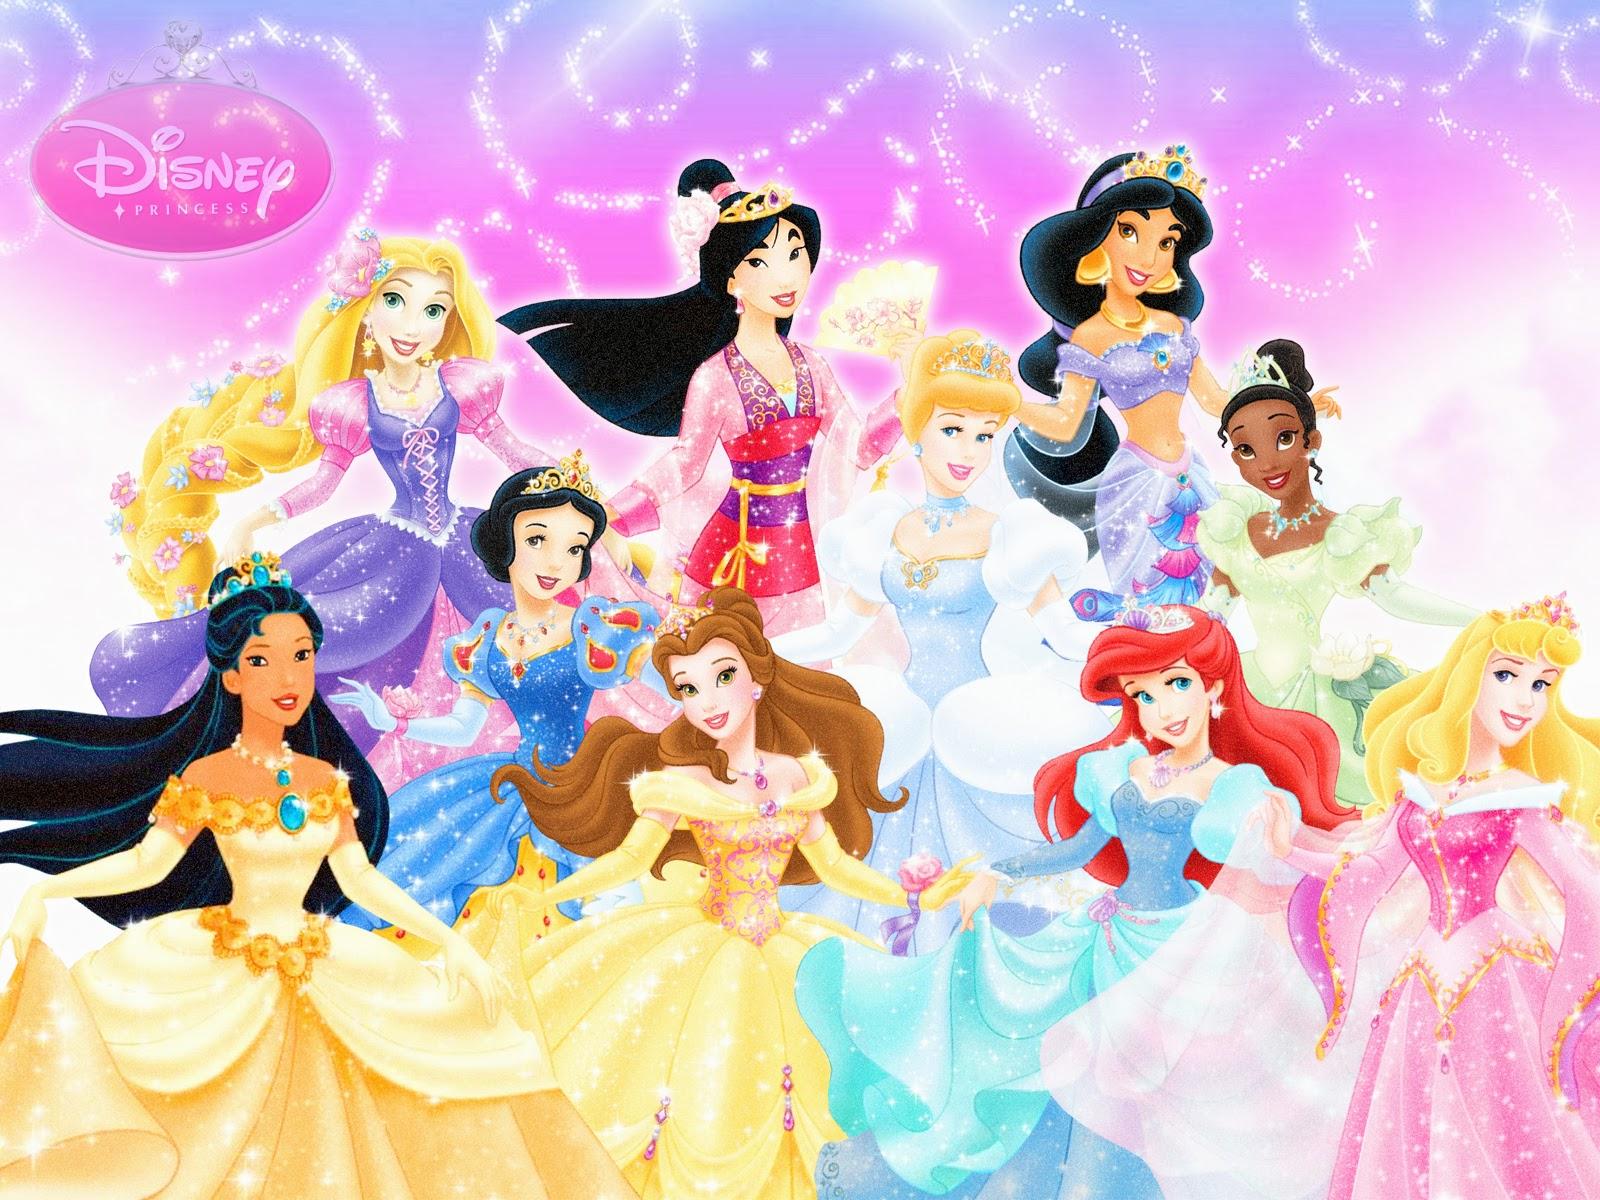 Disney Princess HD Wallpapers Free Download